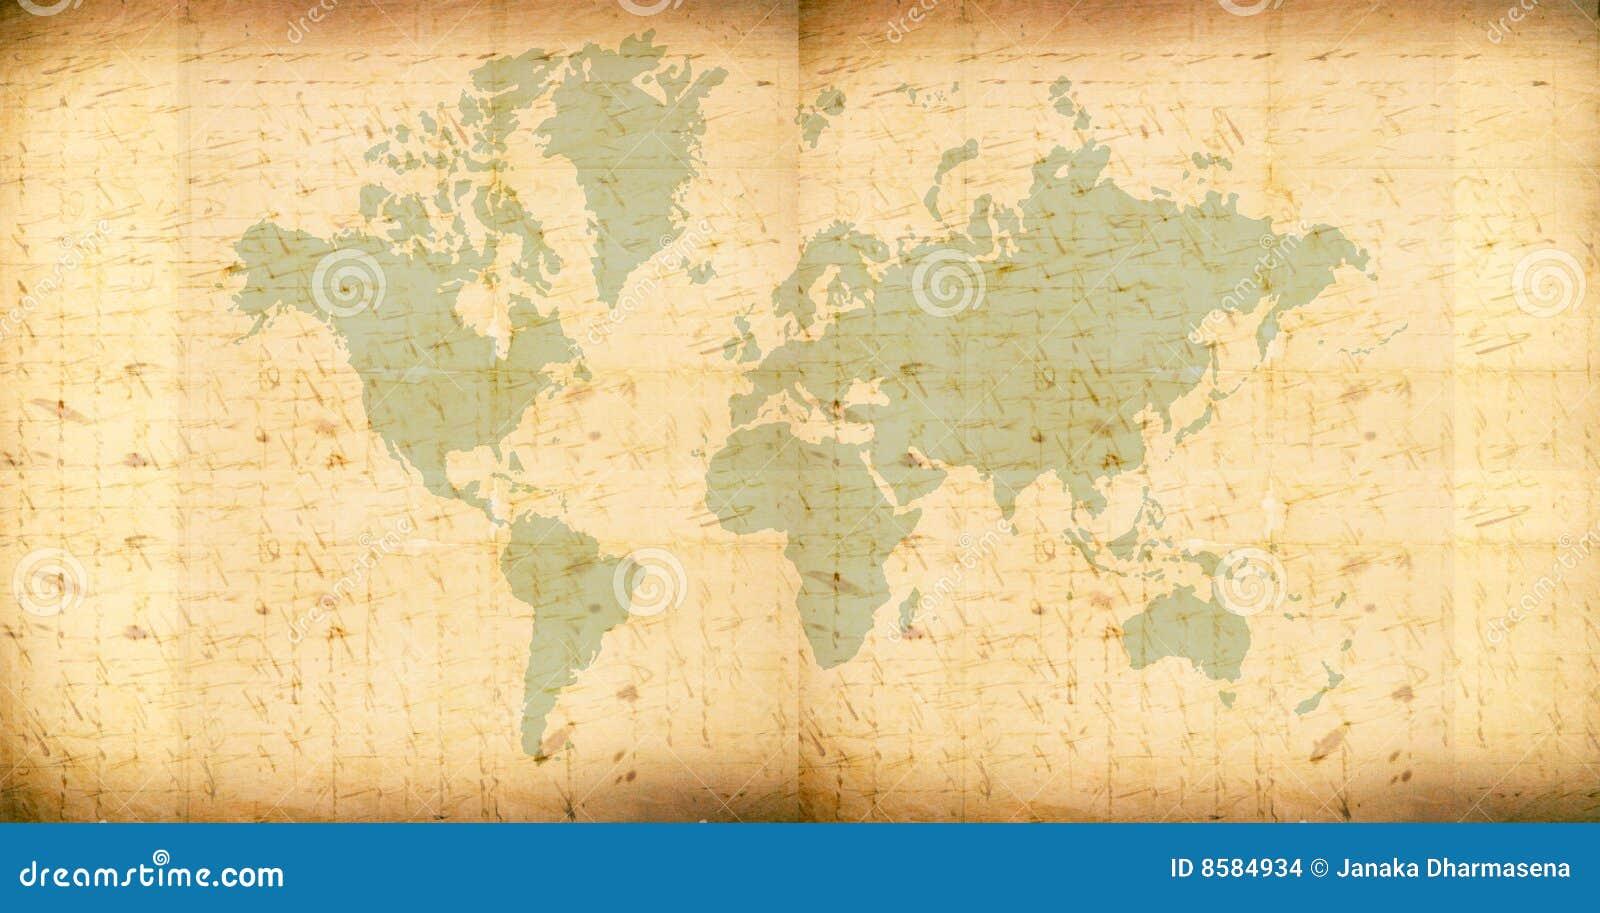 Vintage world map stock illustration illustration of africa 8584934 vintage world map royalty free stock photo gumiabroncs Gallery